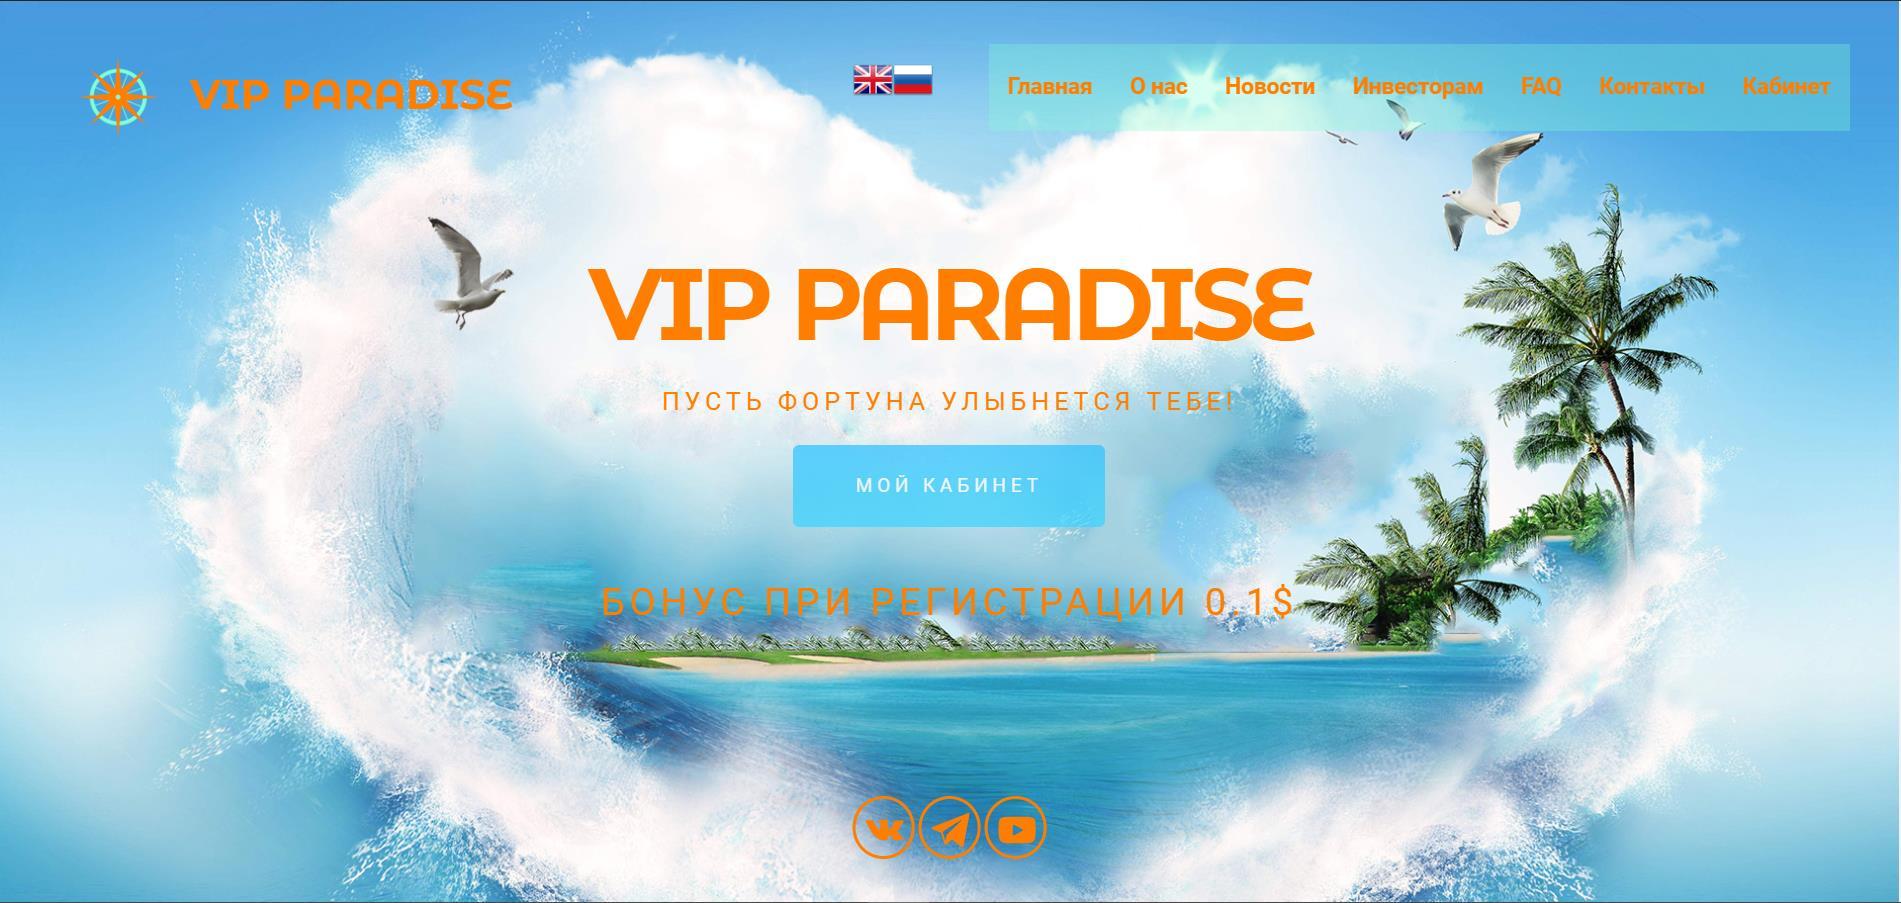 VIP PARADISE